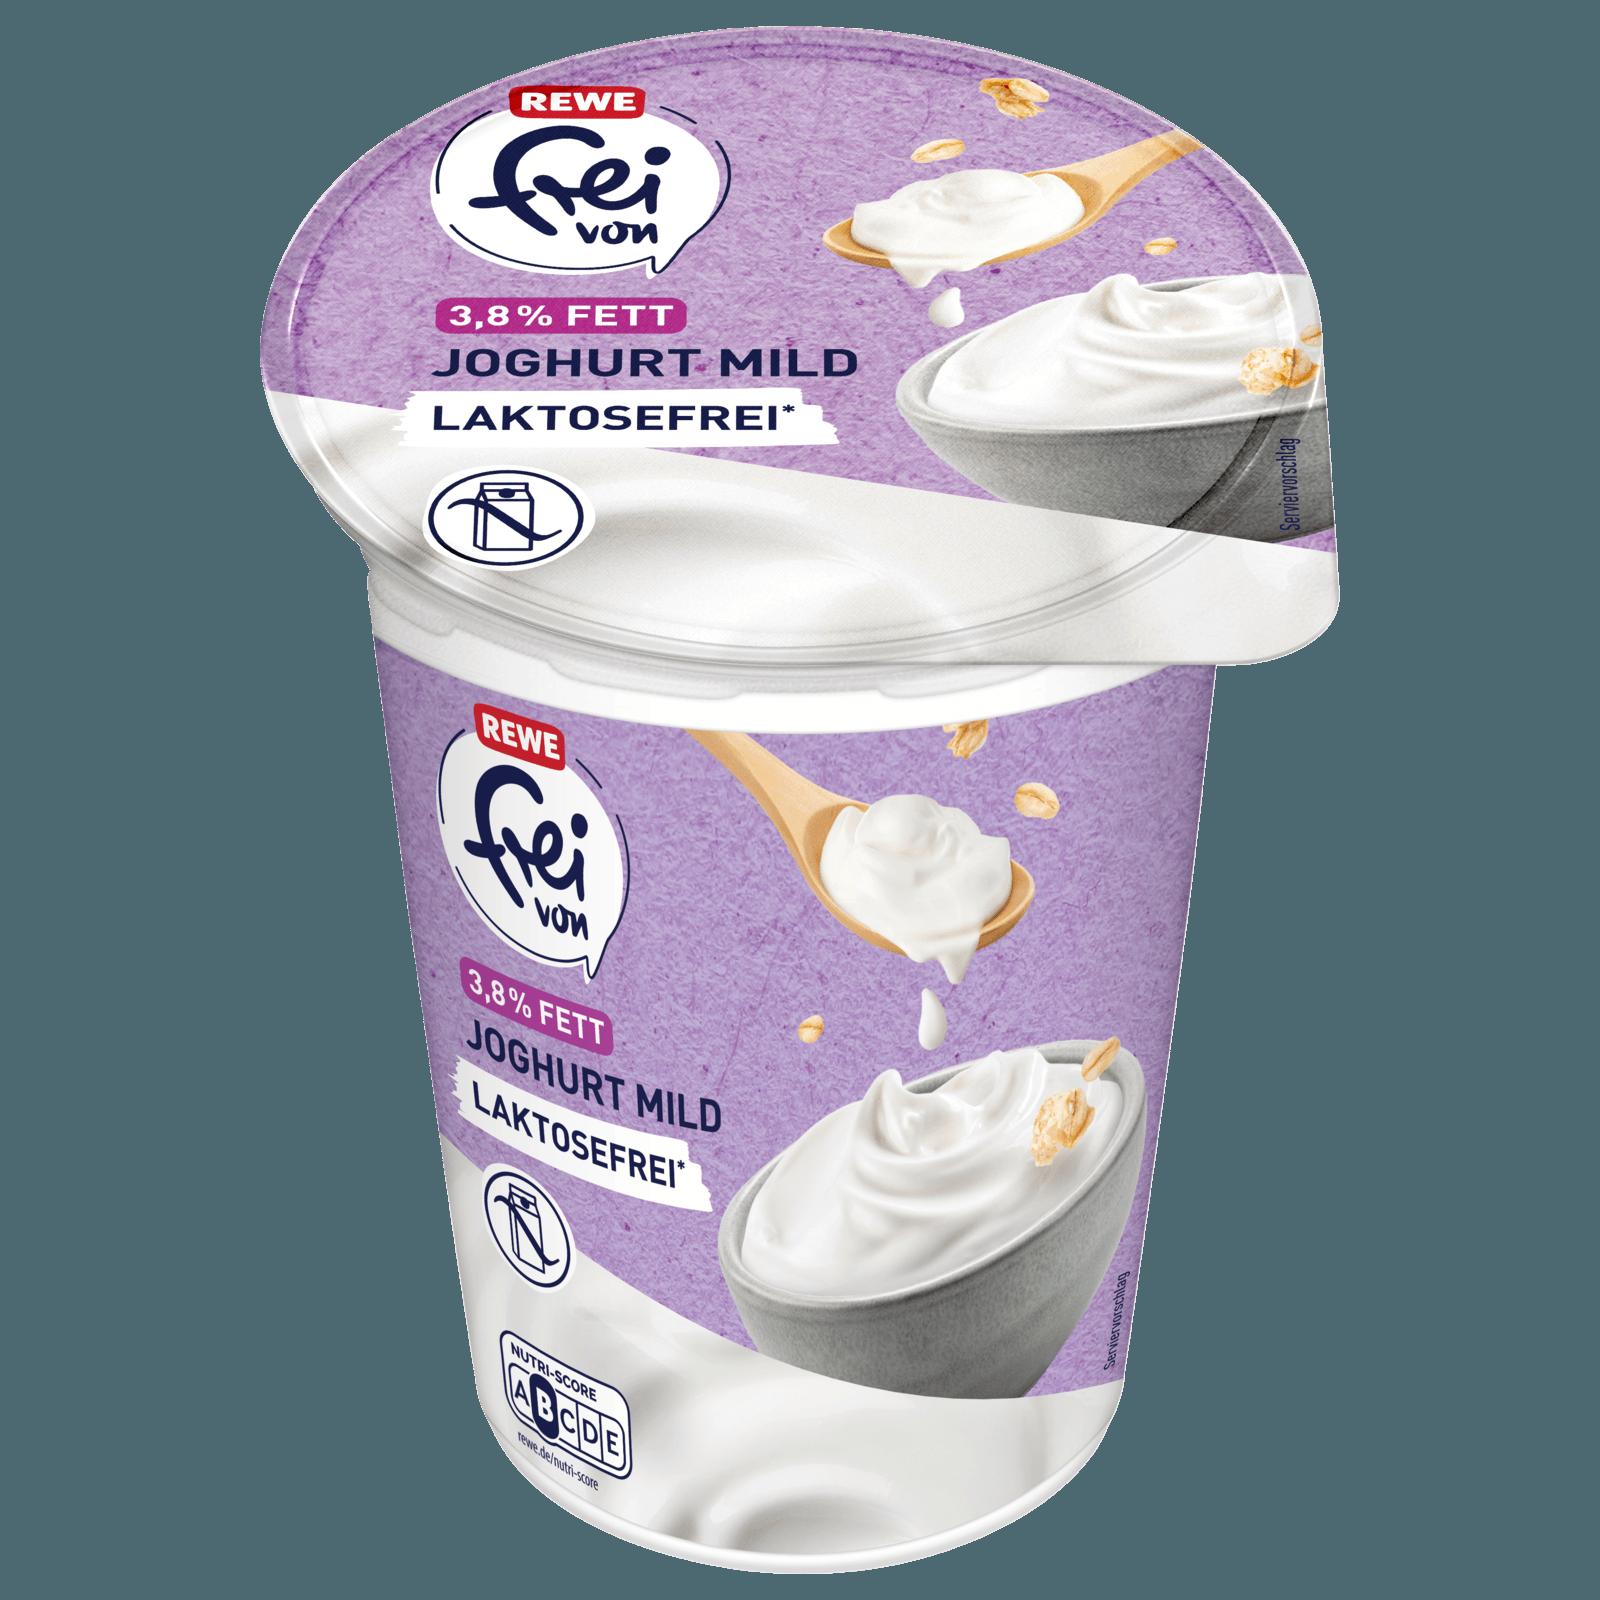 joghurt 0 1 fett gesund